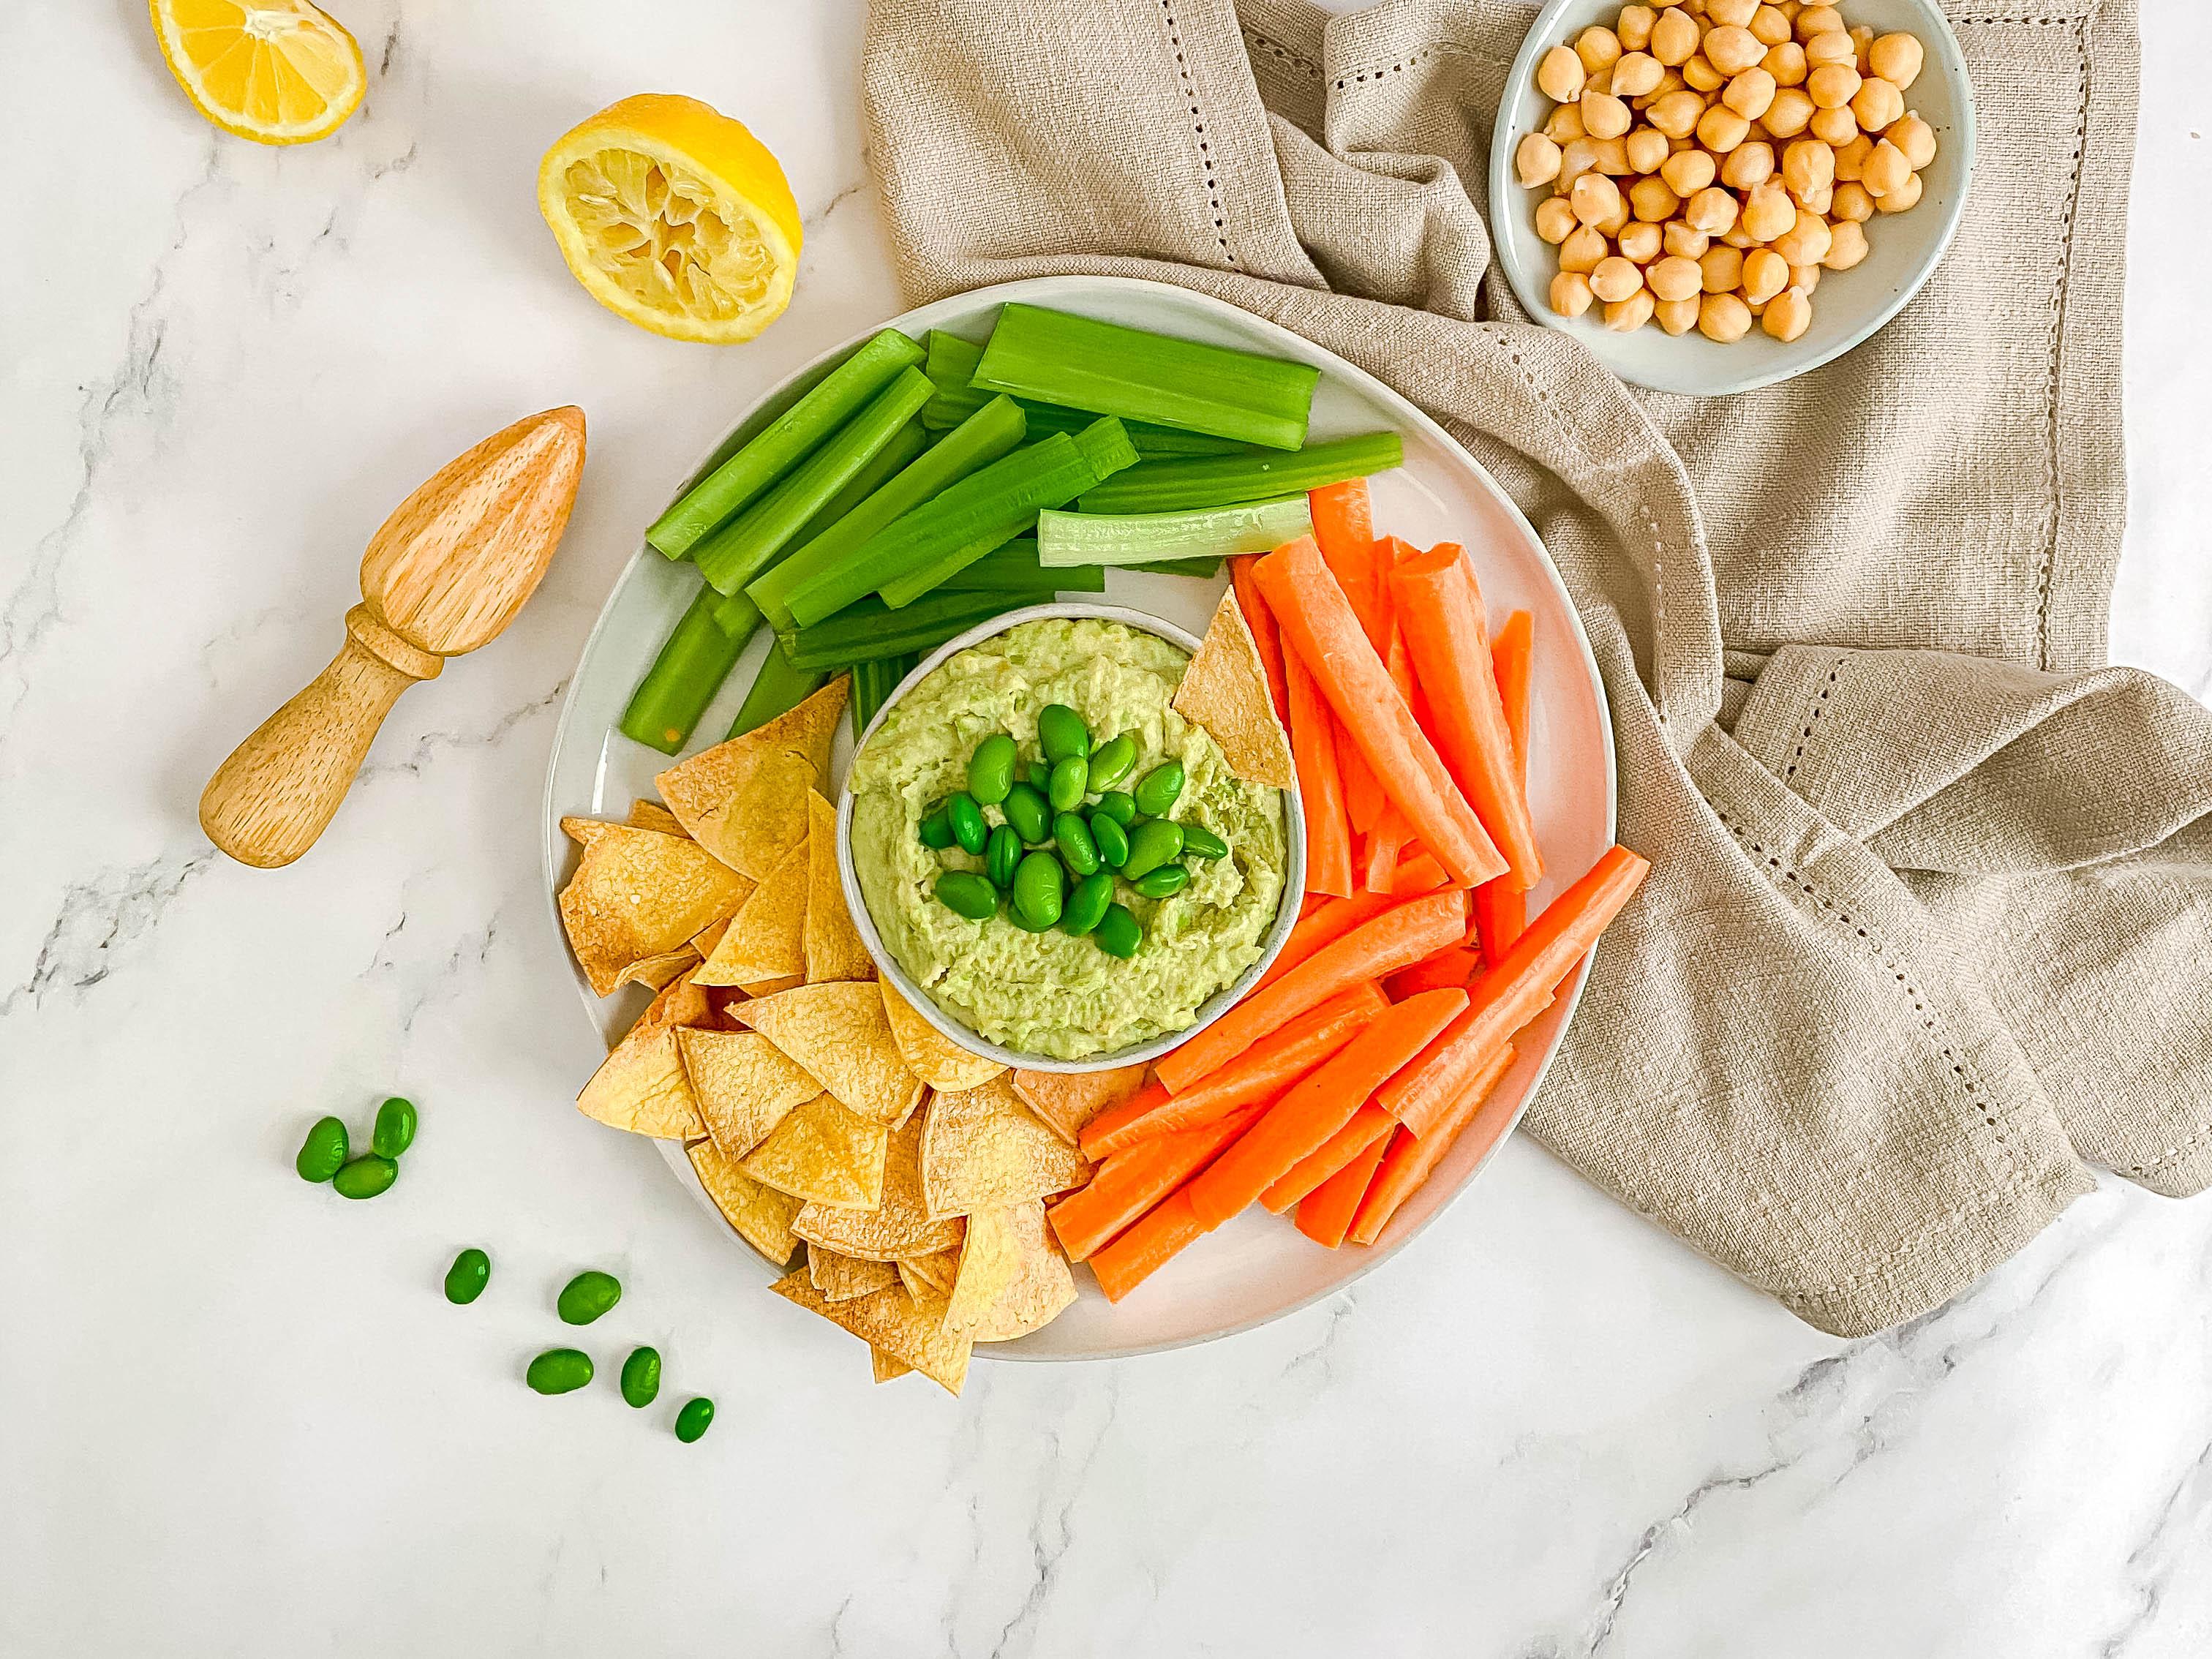 Oil-Free Edamame Hummus